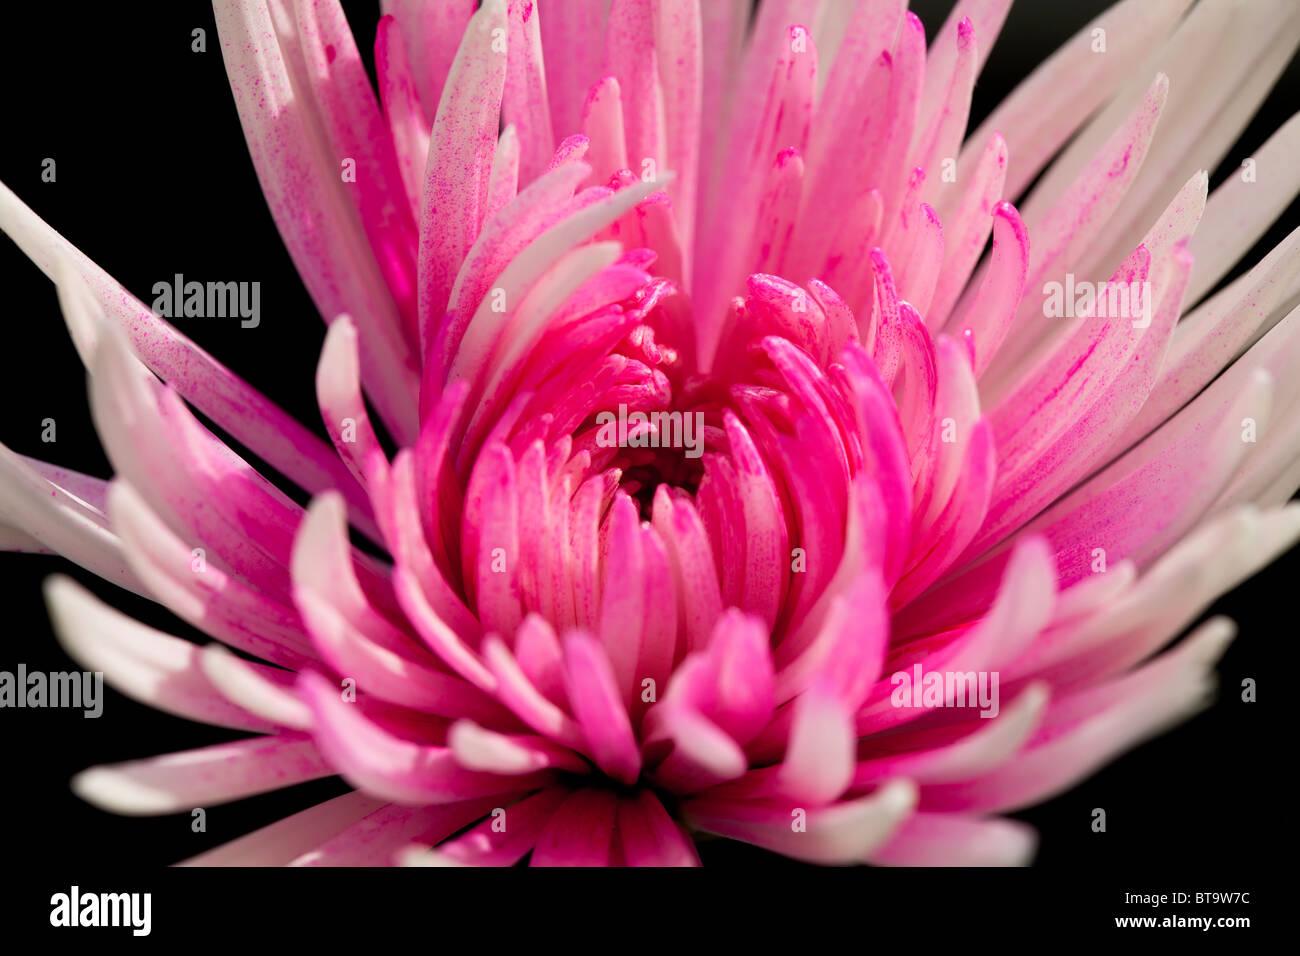 White mum flower stock photos white mum flower stock images alamy pink and white chrysanthemum flower stock image mightylinksfo